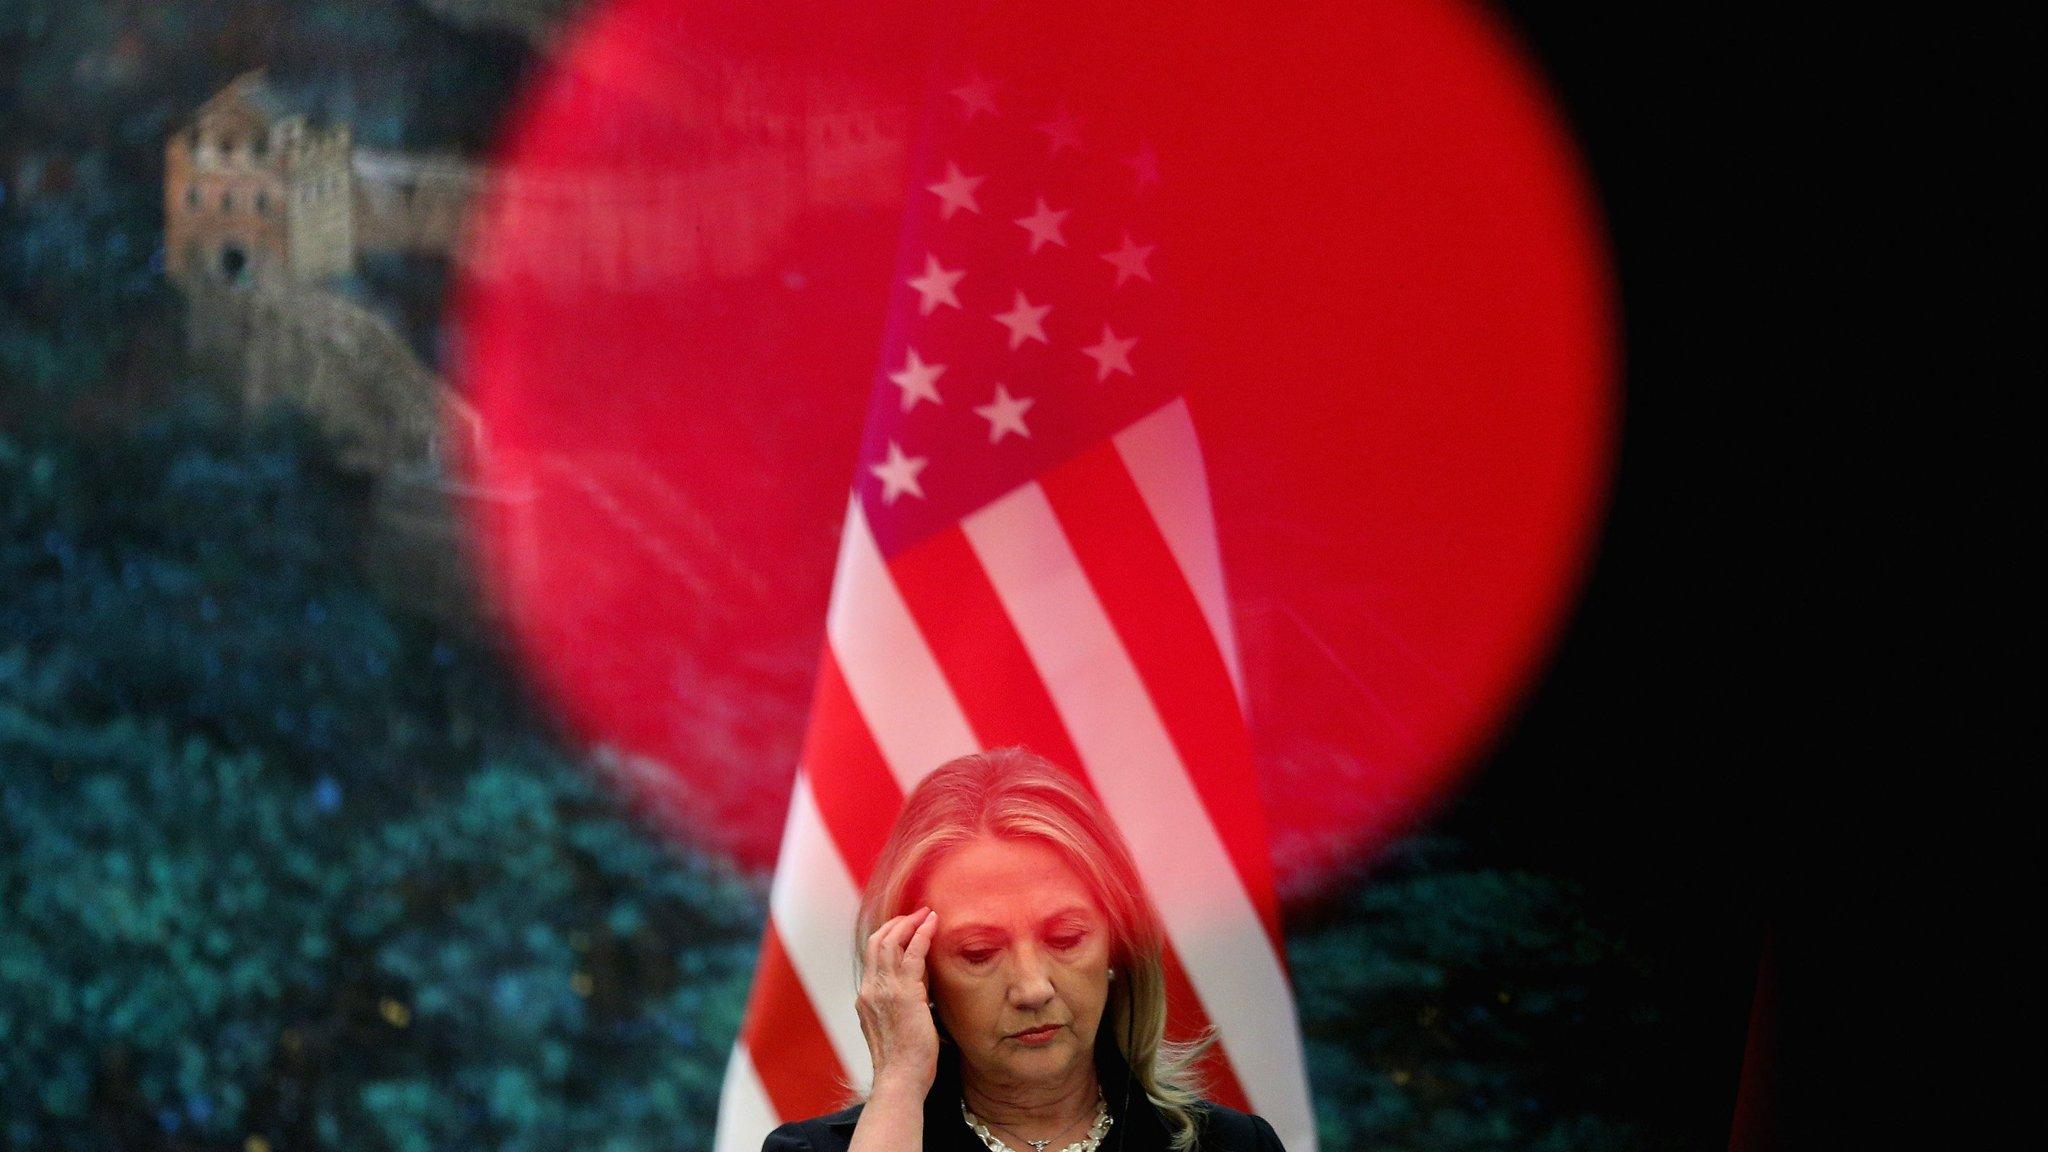 hillary clinton beijing speech analysis